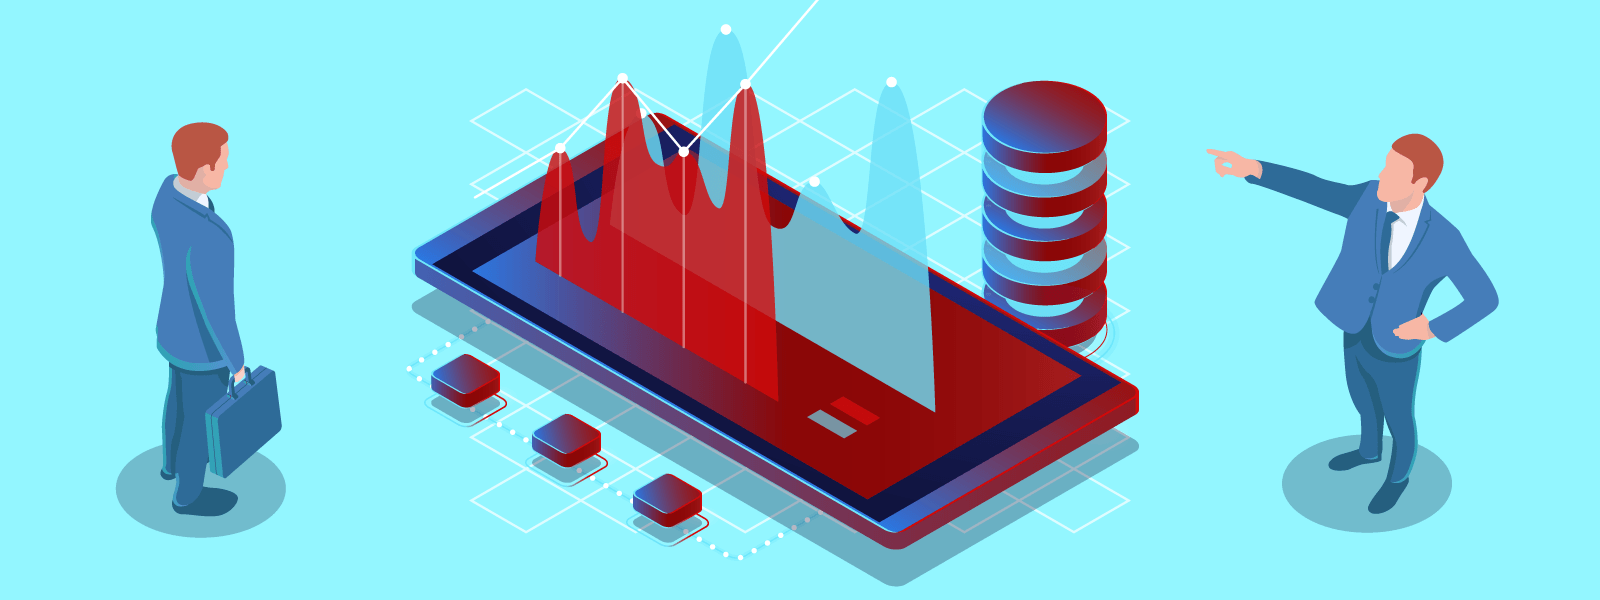 Binary Options Charts - How Anaylize Trading Charts